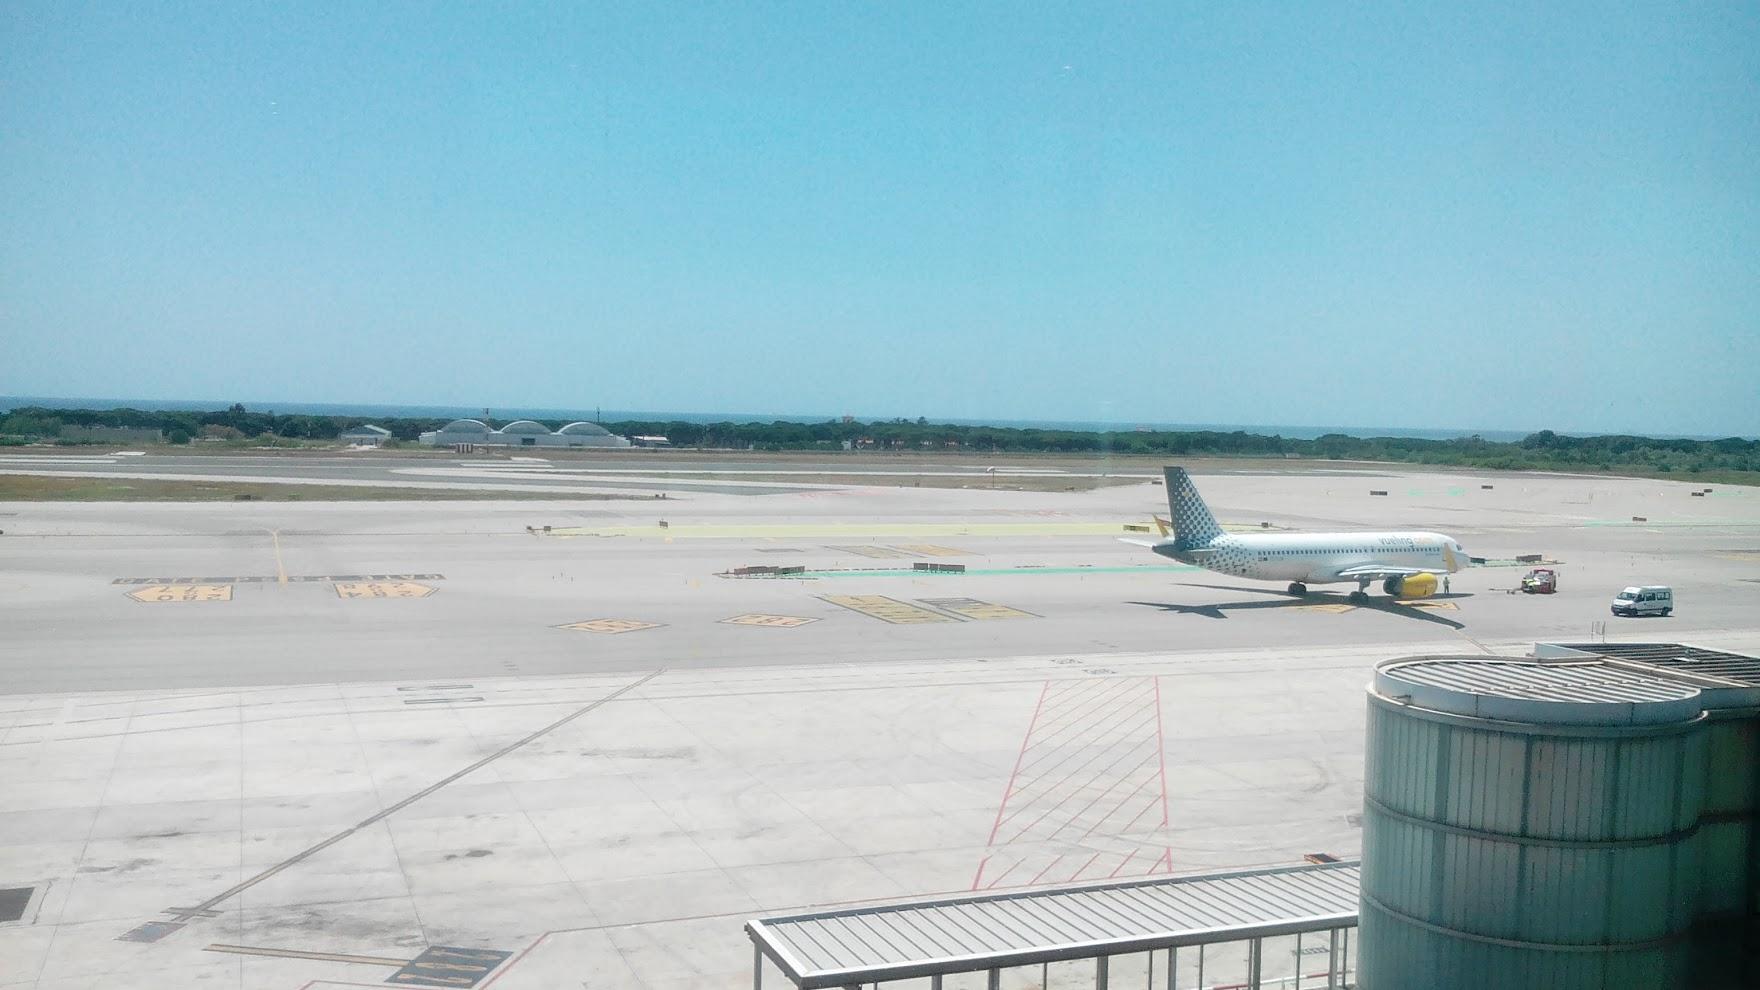 Вид на море из аэропорта